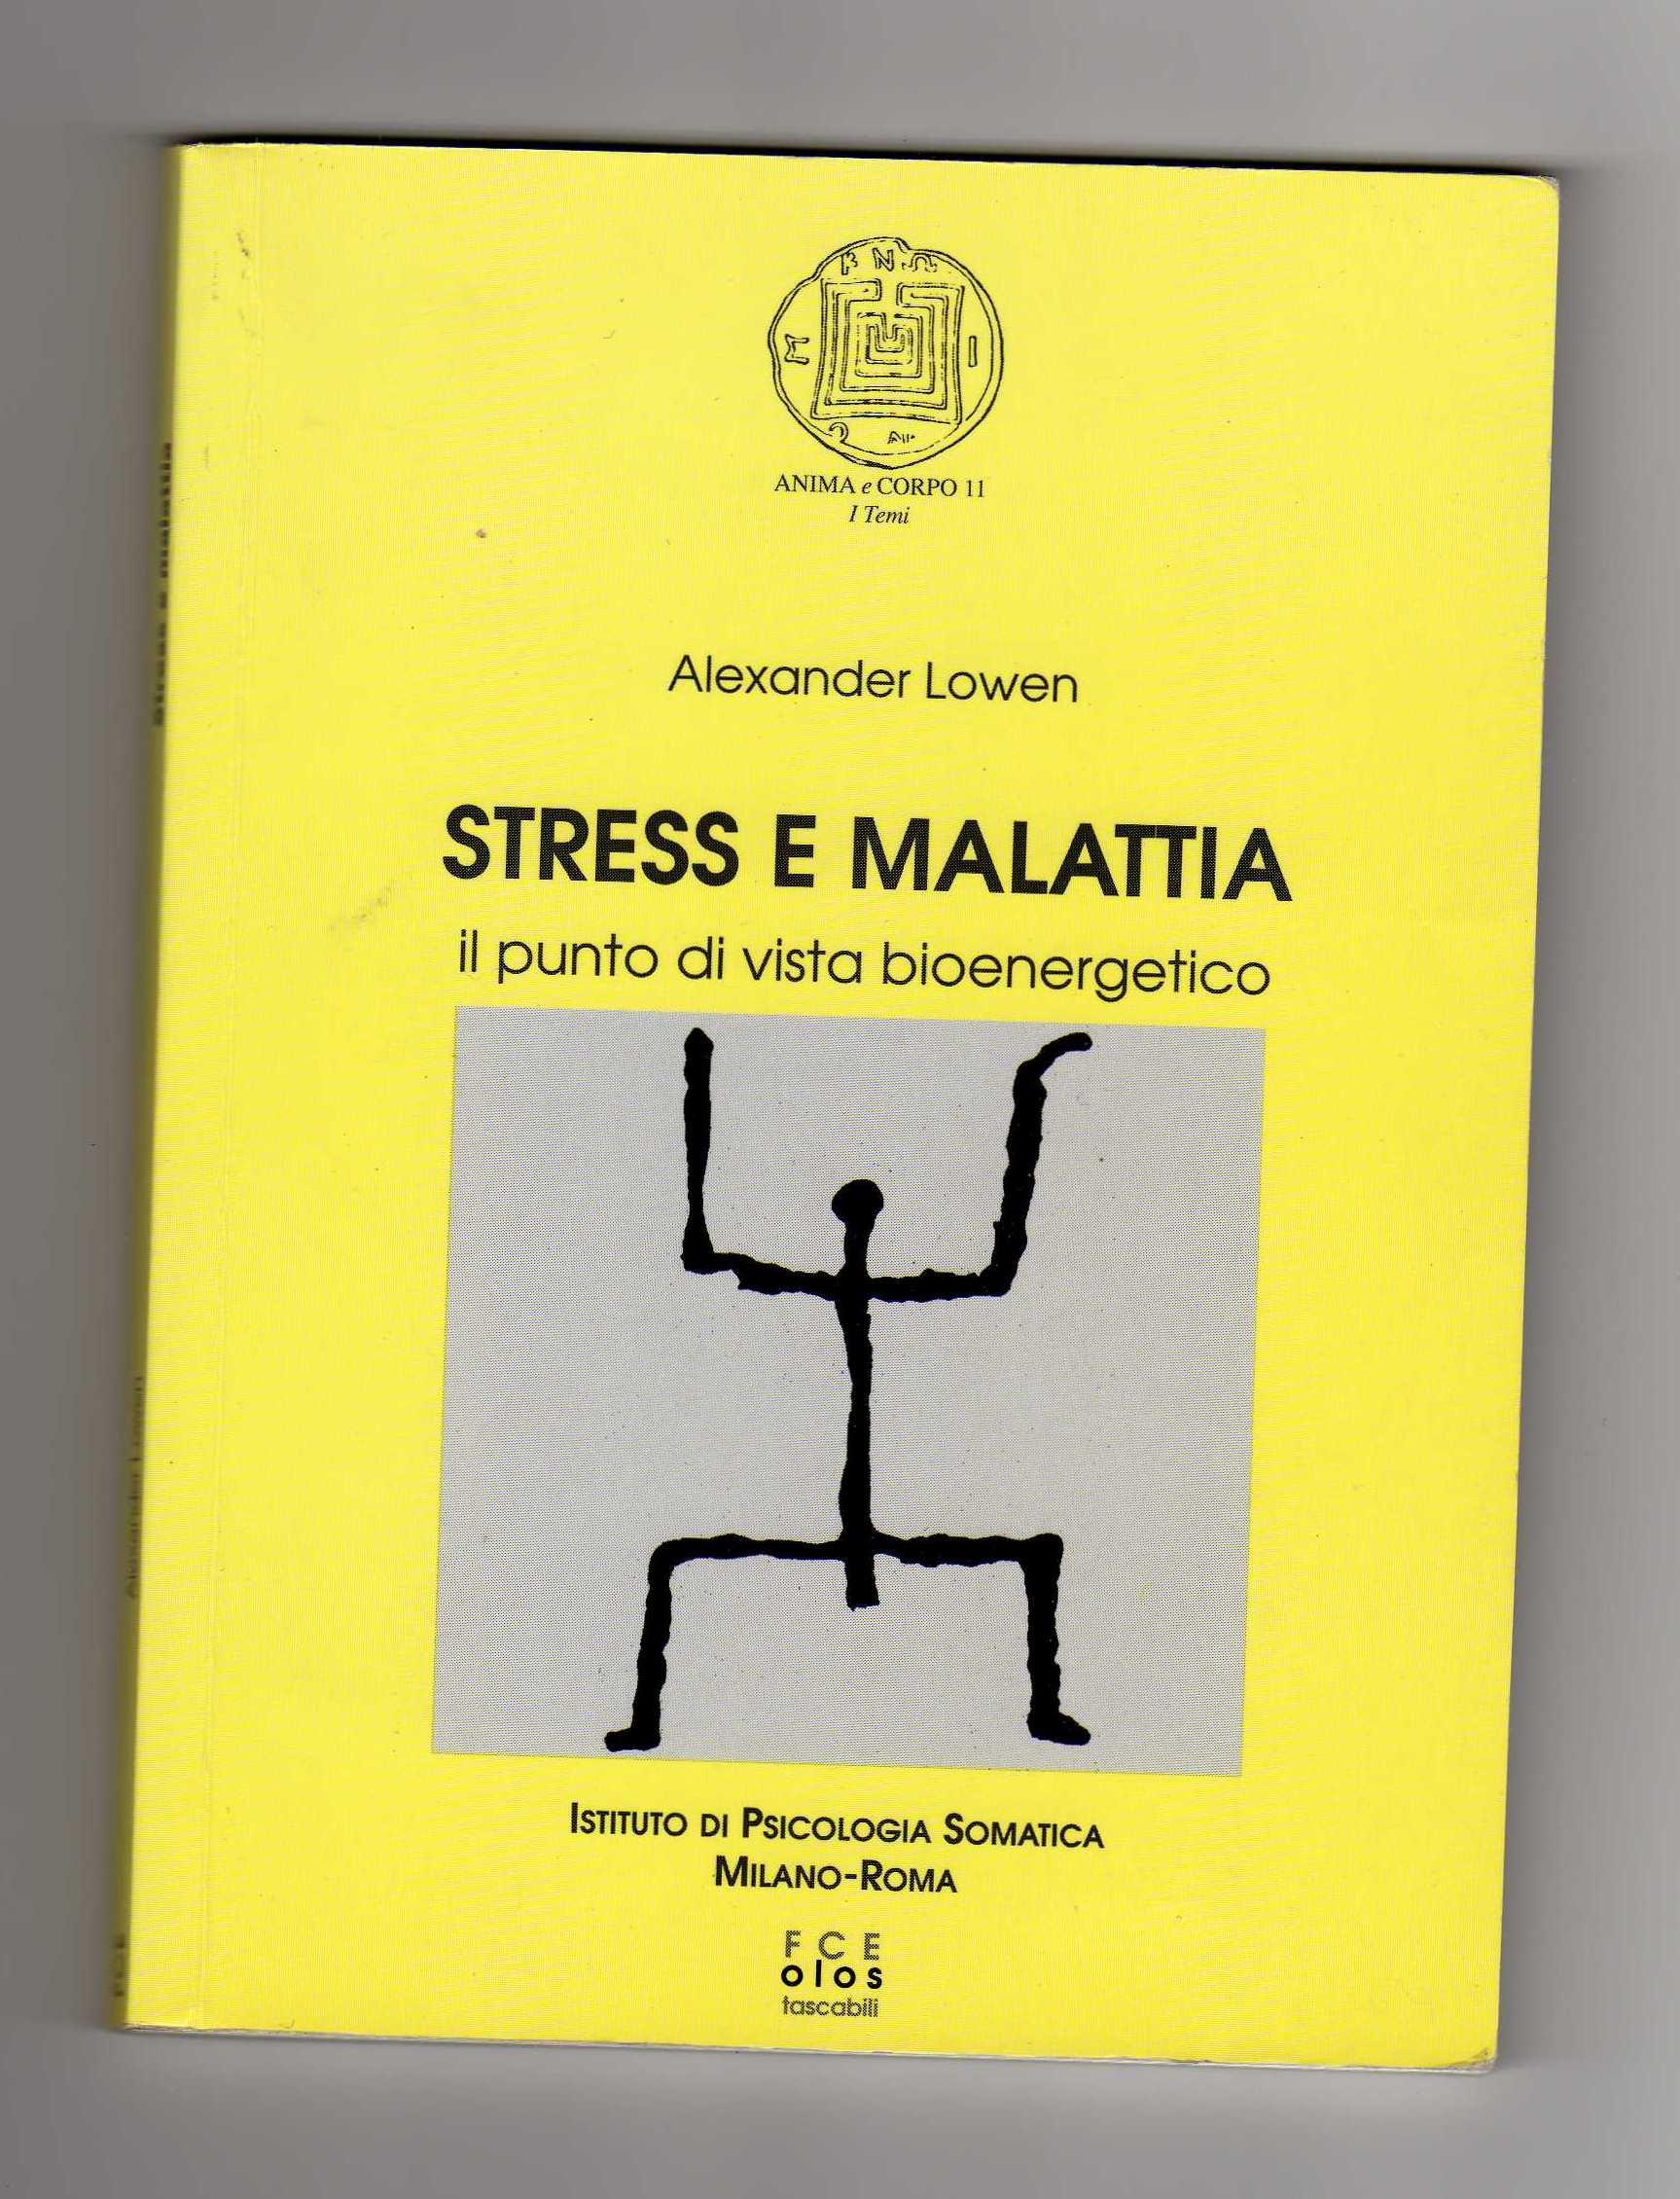 Stress e malattia